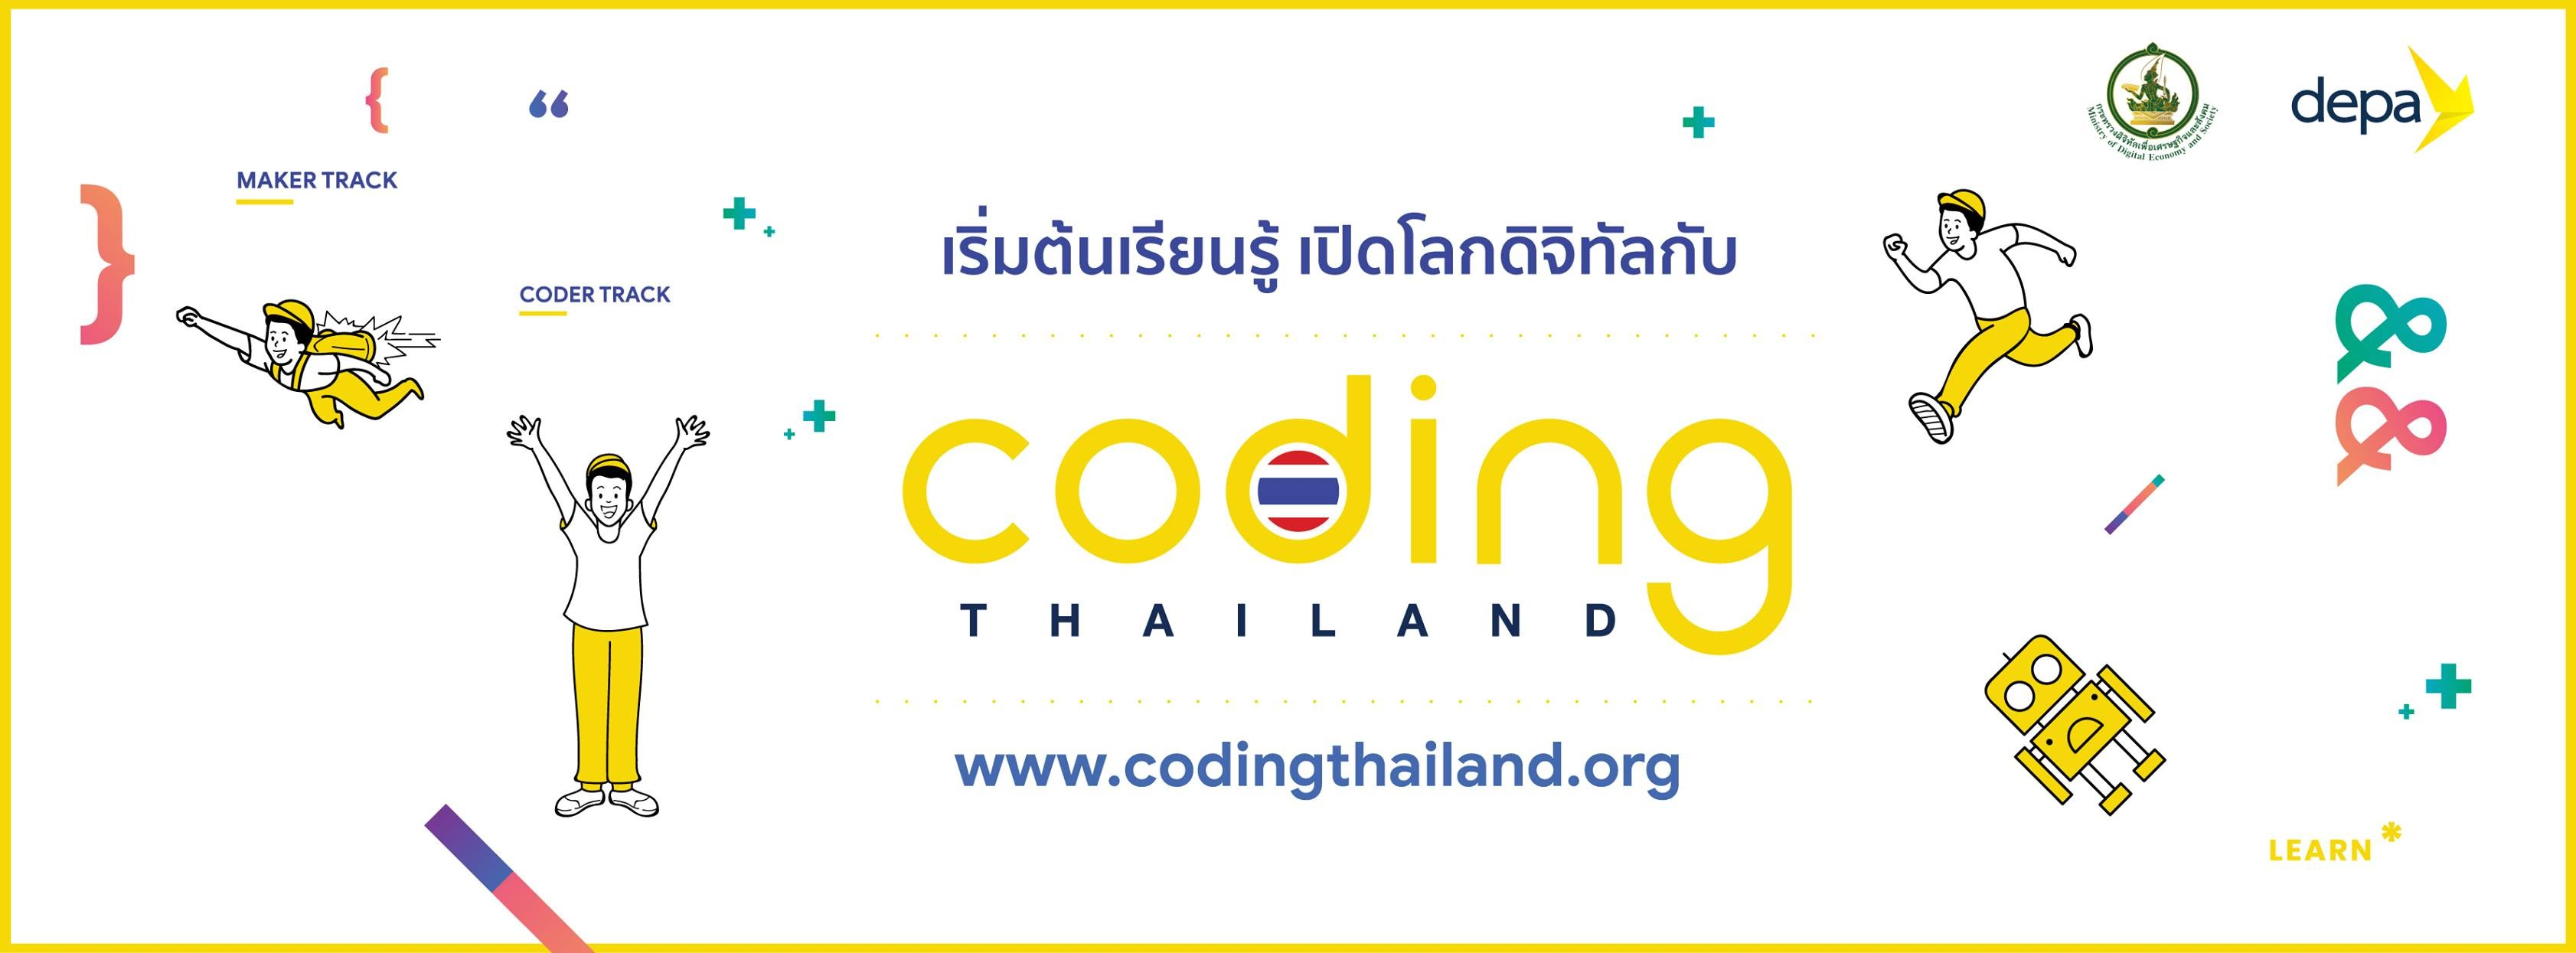 https://www.codingthailand.org/learn/